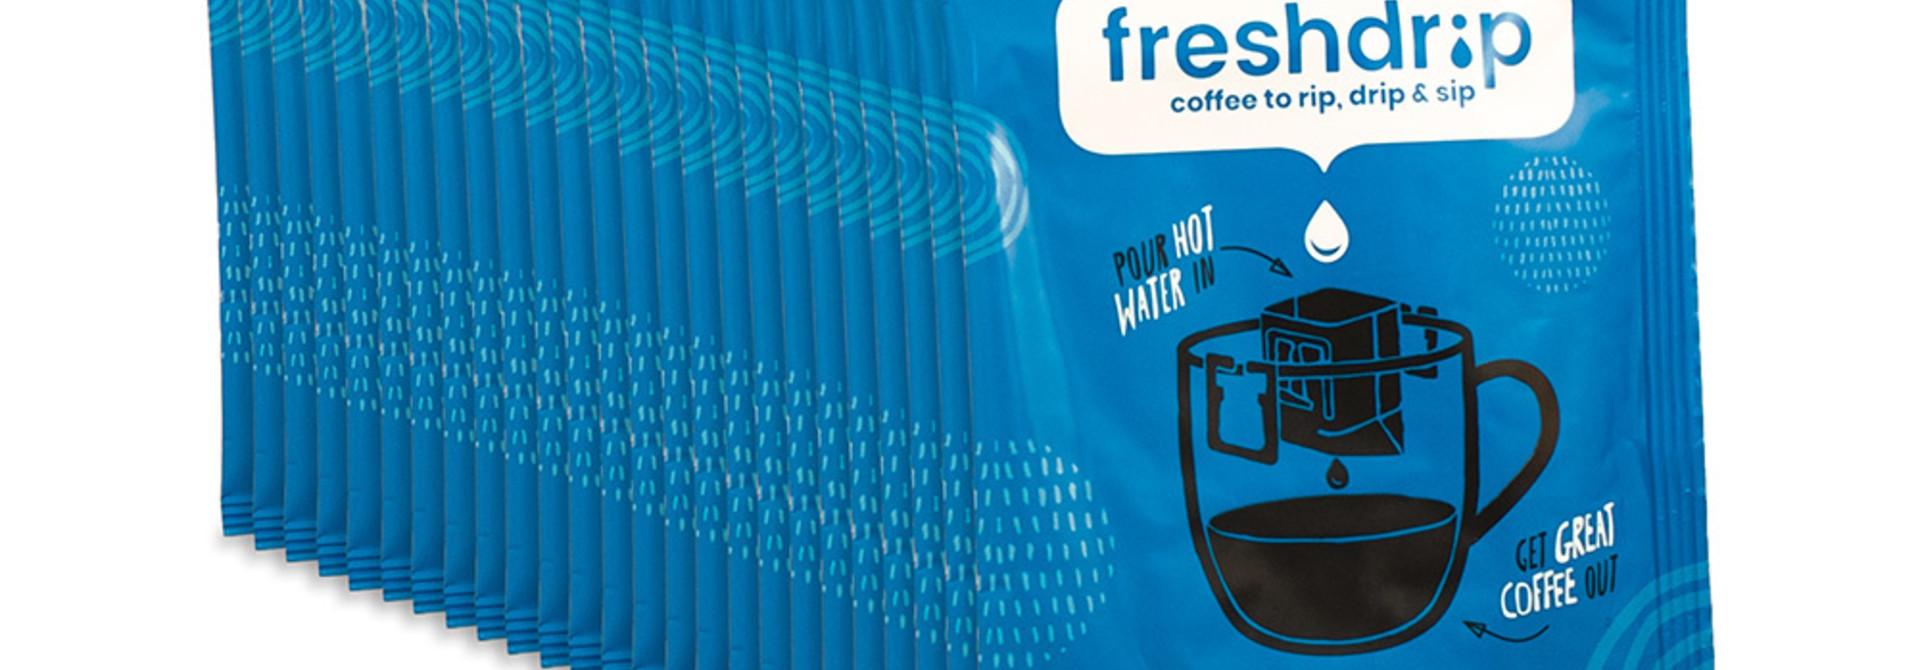 Cafeïnevrij filterkoffie | Ethiopië | 50 Freshdrips voordeelpak